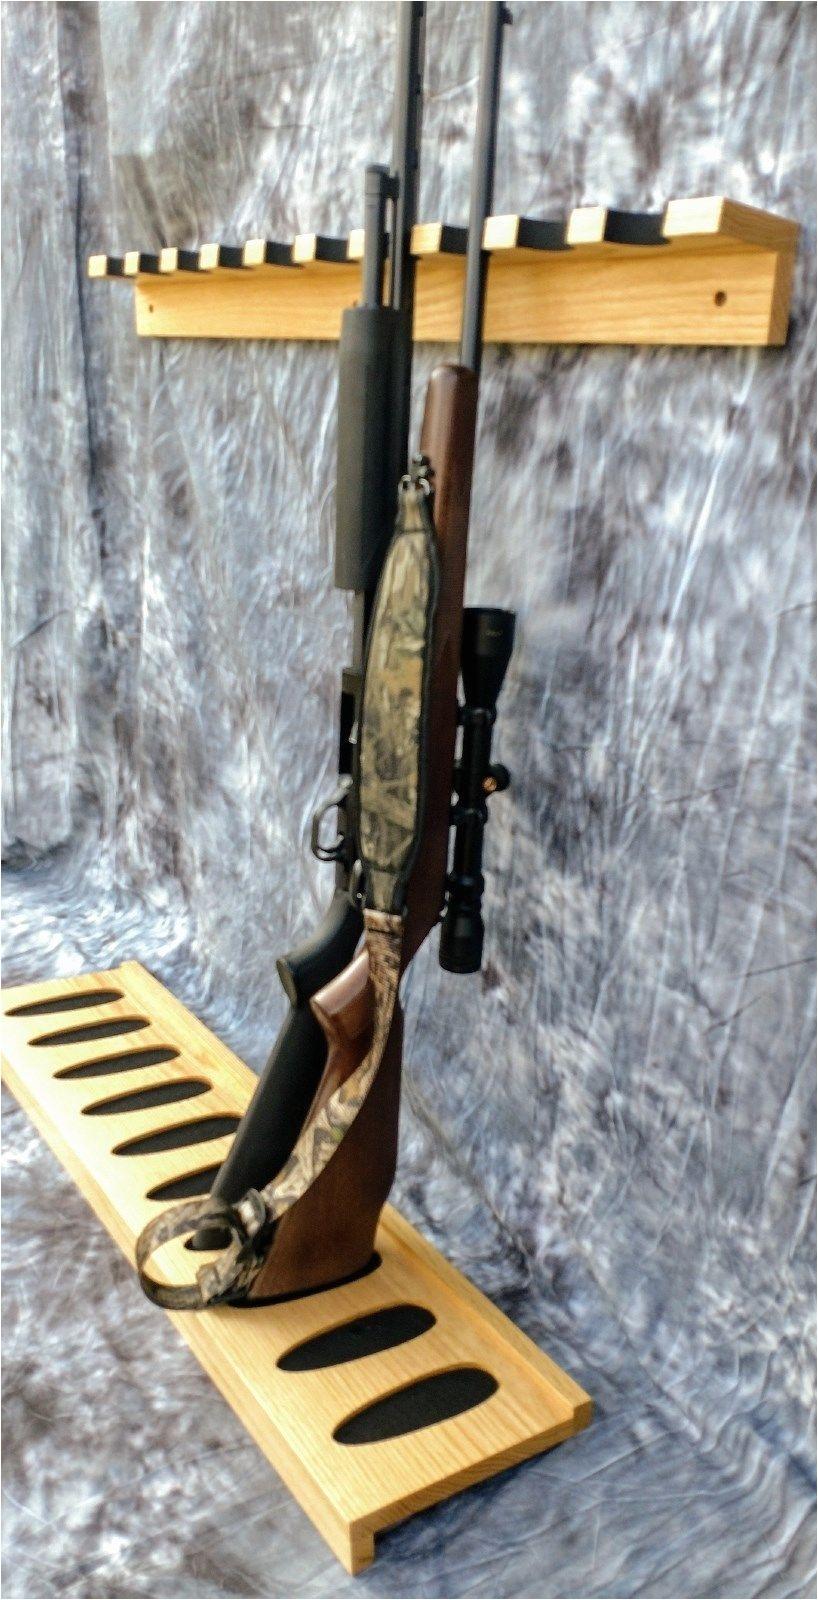 10 gun rack closet wall hunting camp storage garage basement closet oak wood